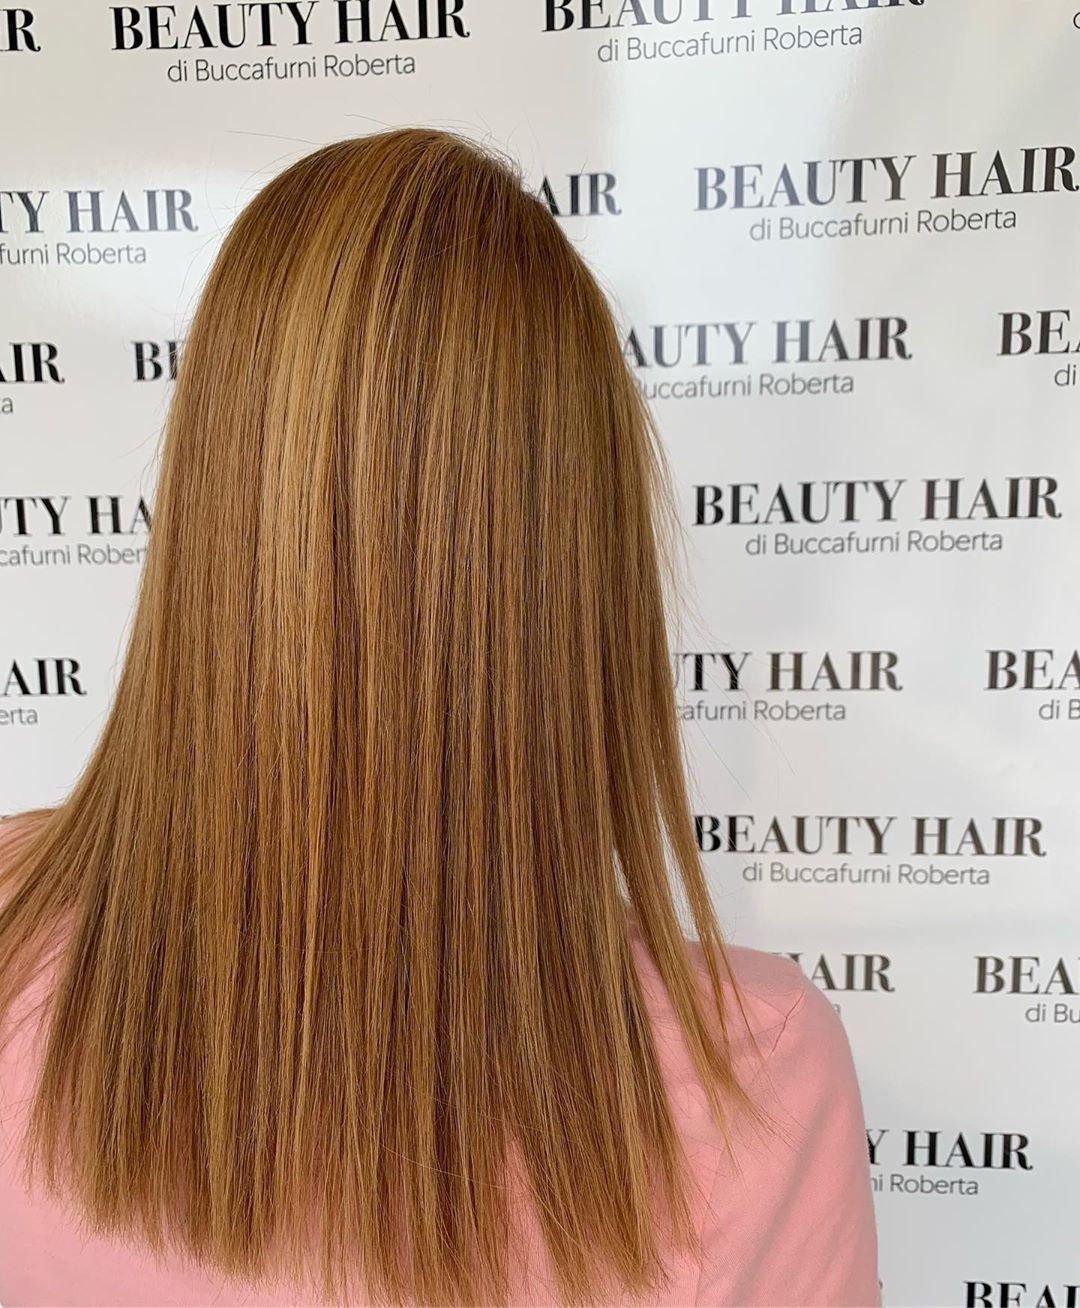 Sfumaturecapelli Biondo Biondomiele Capellilisci Glamour Passion Hair Hairart Hairstyle Hairstyles Hair Hair Styles Cool Hairstyles Long Hair Styles